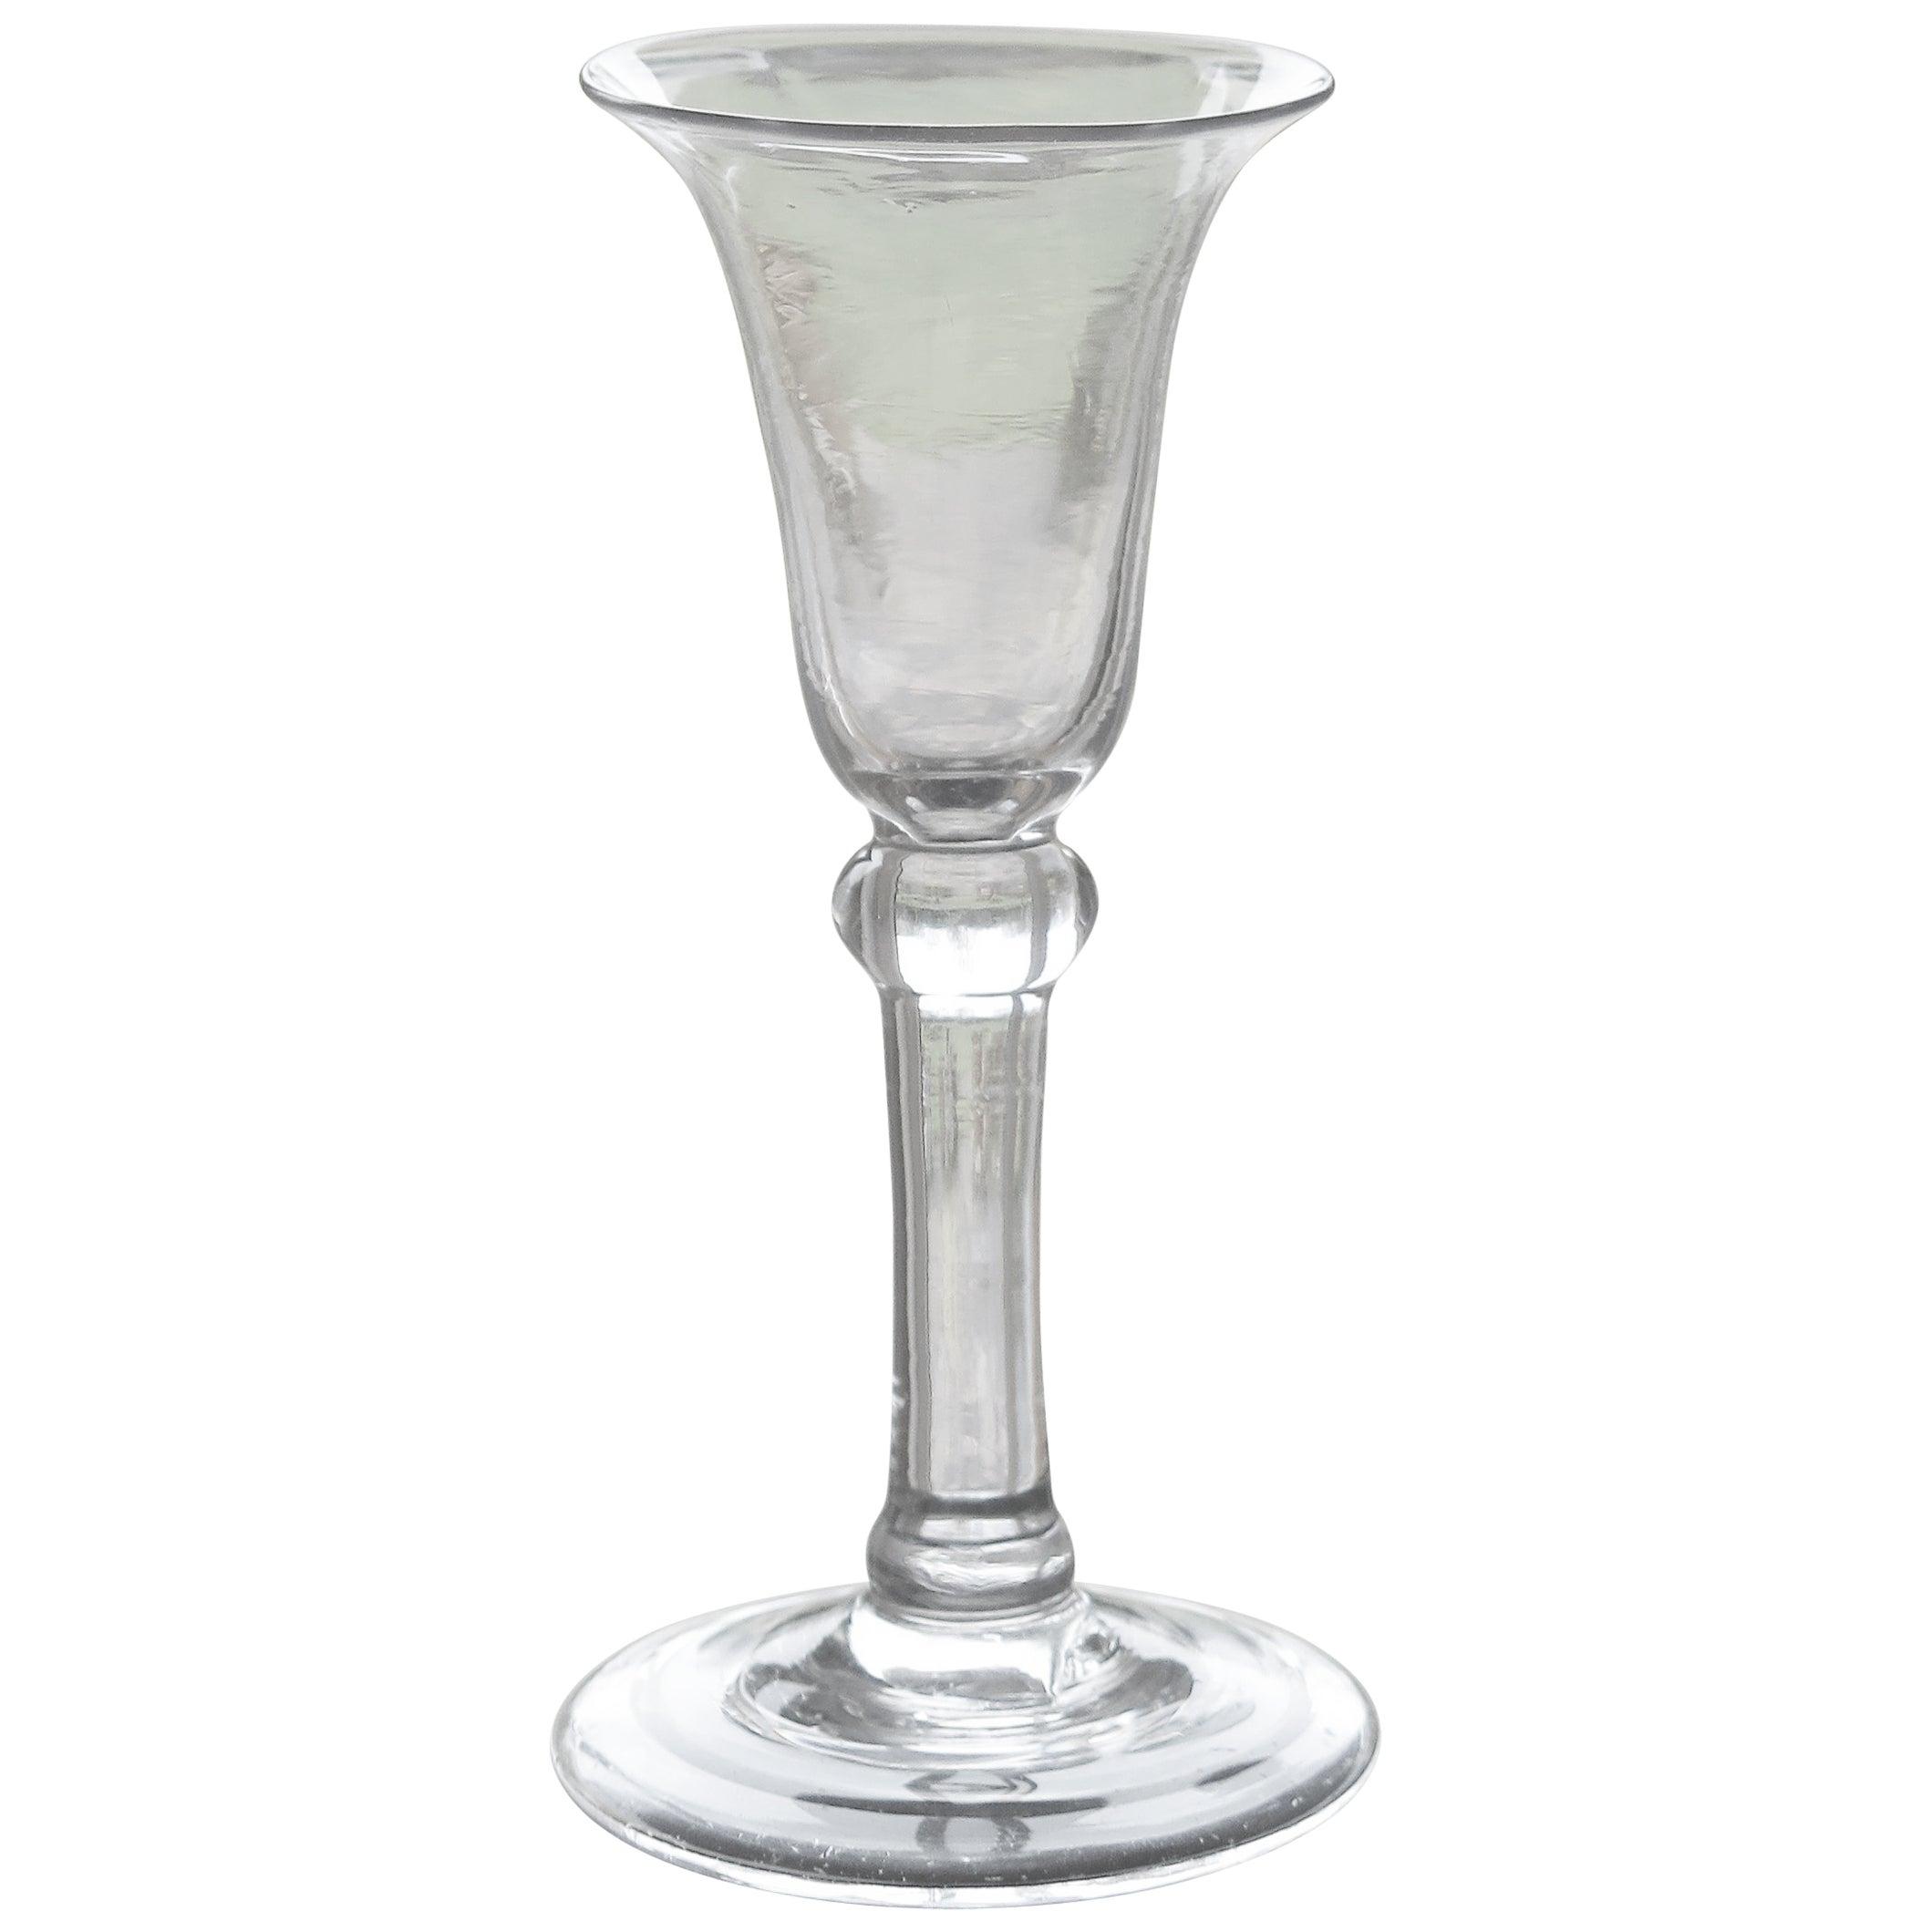 Tapio Wirkkala Icebreaker Glassware For Iittala, Circa 1960S For Sale